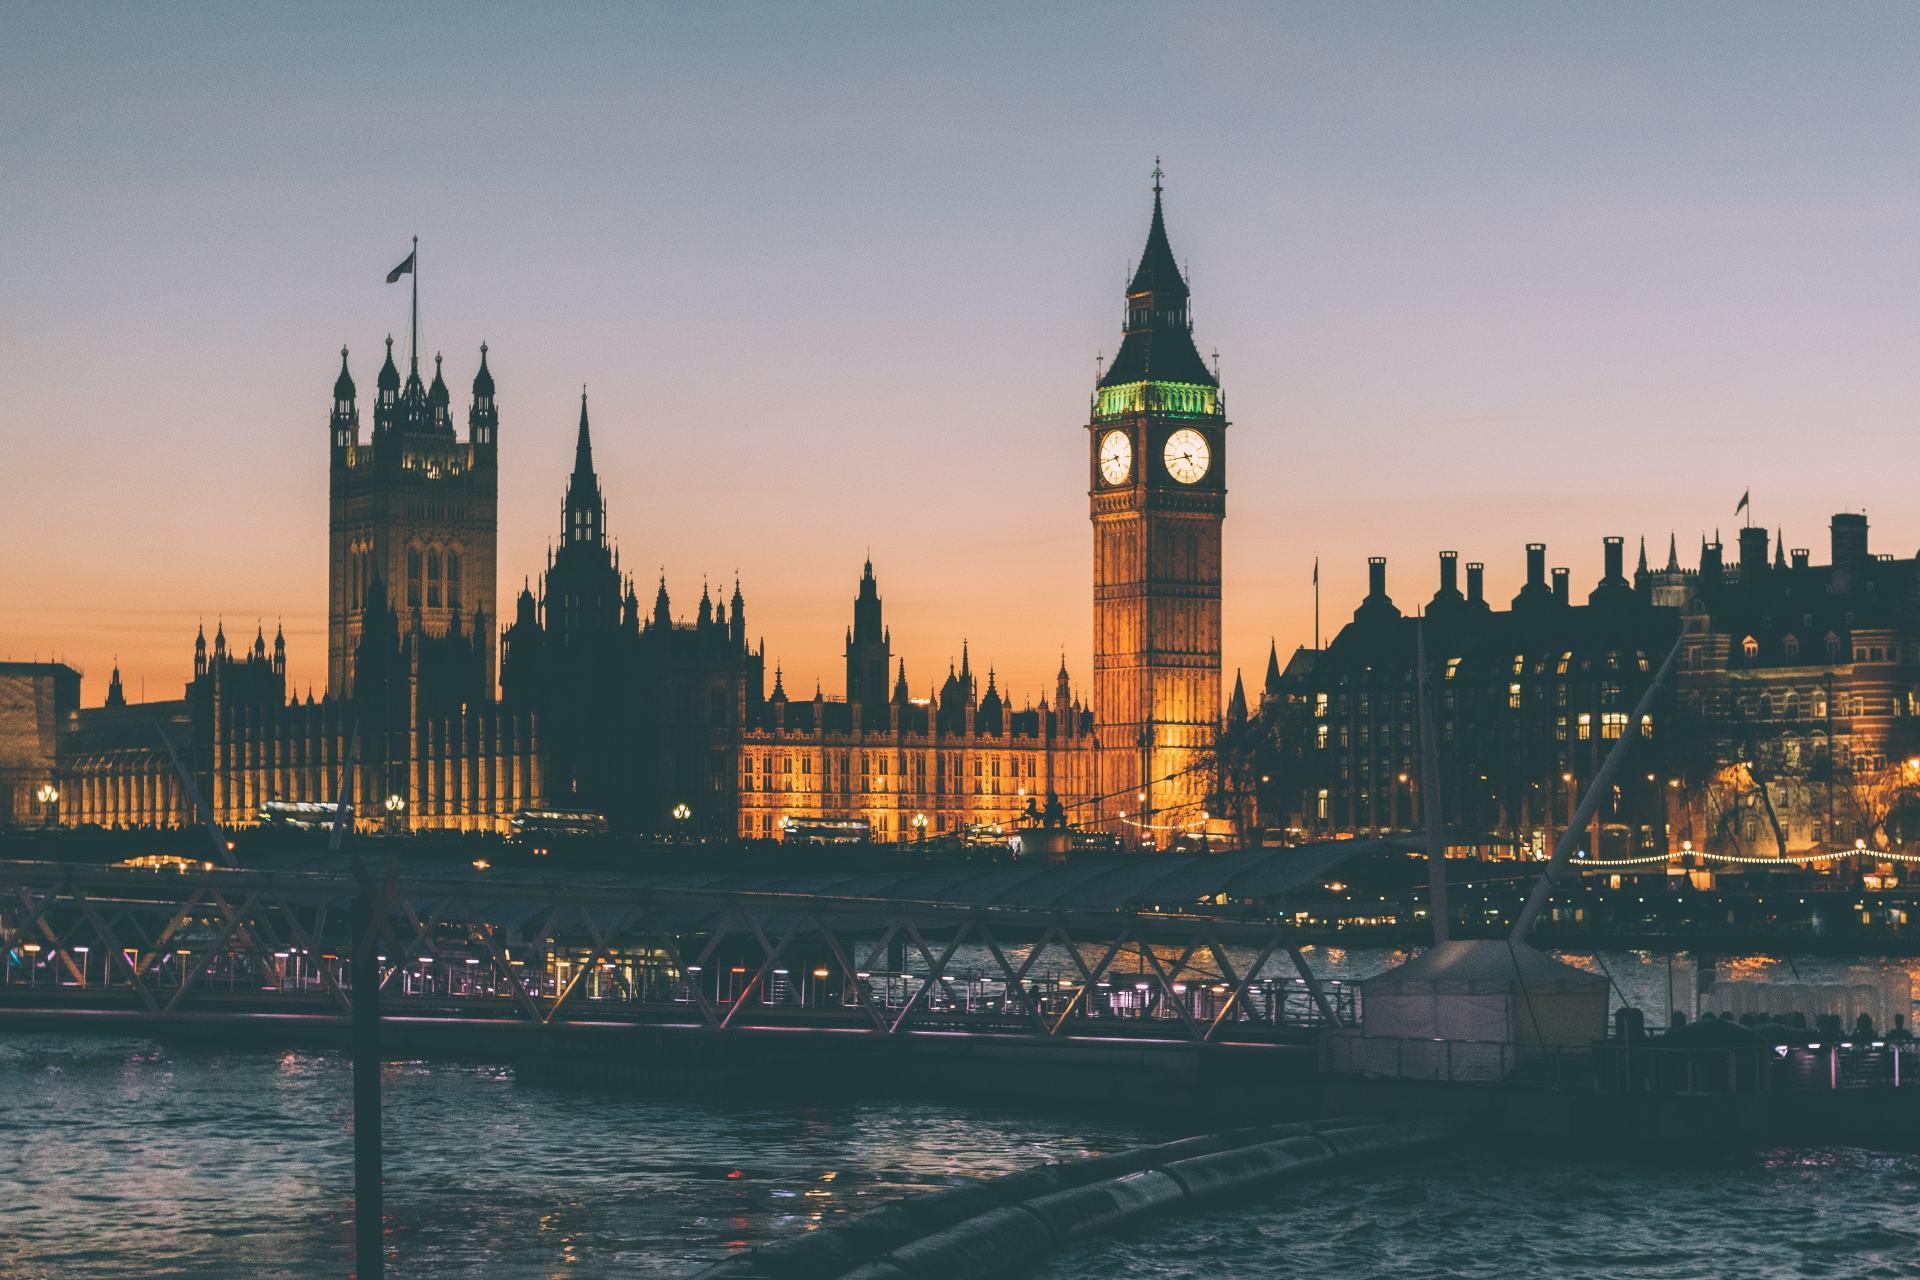 london-night-lights-bridge-50632